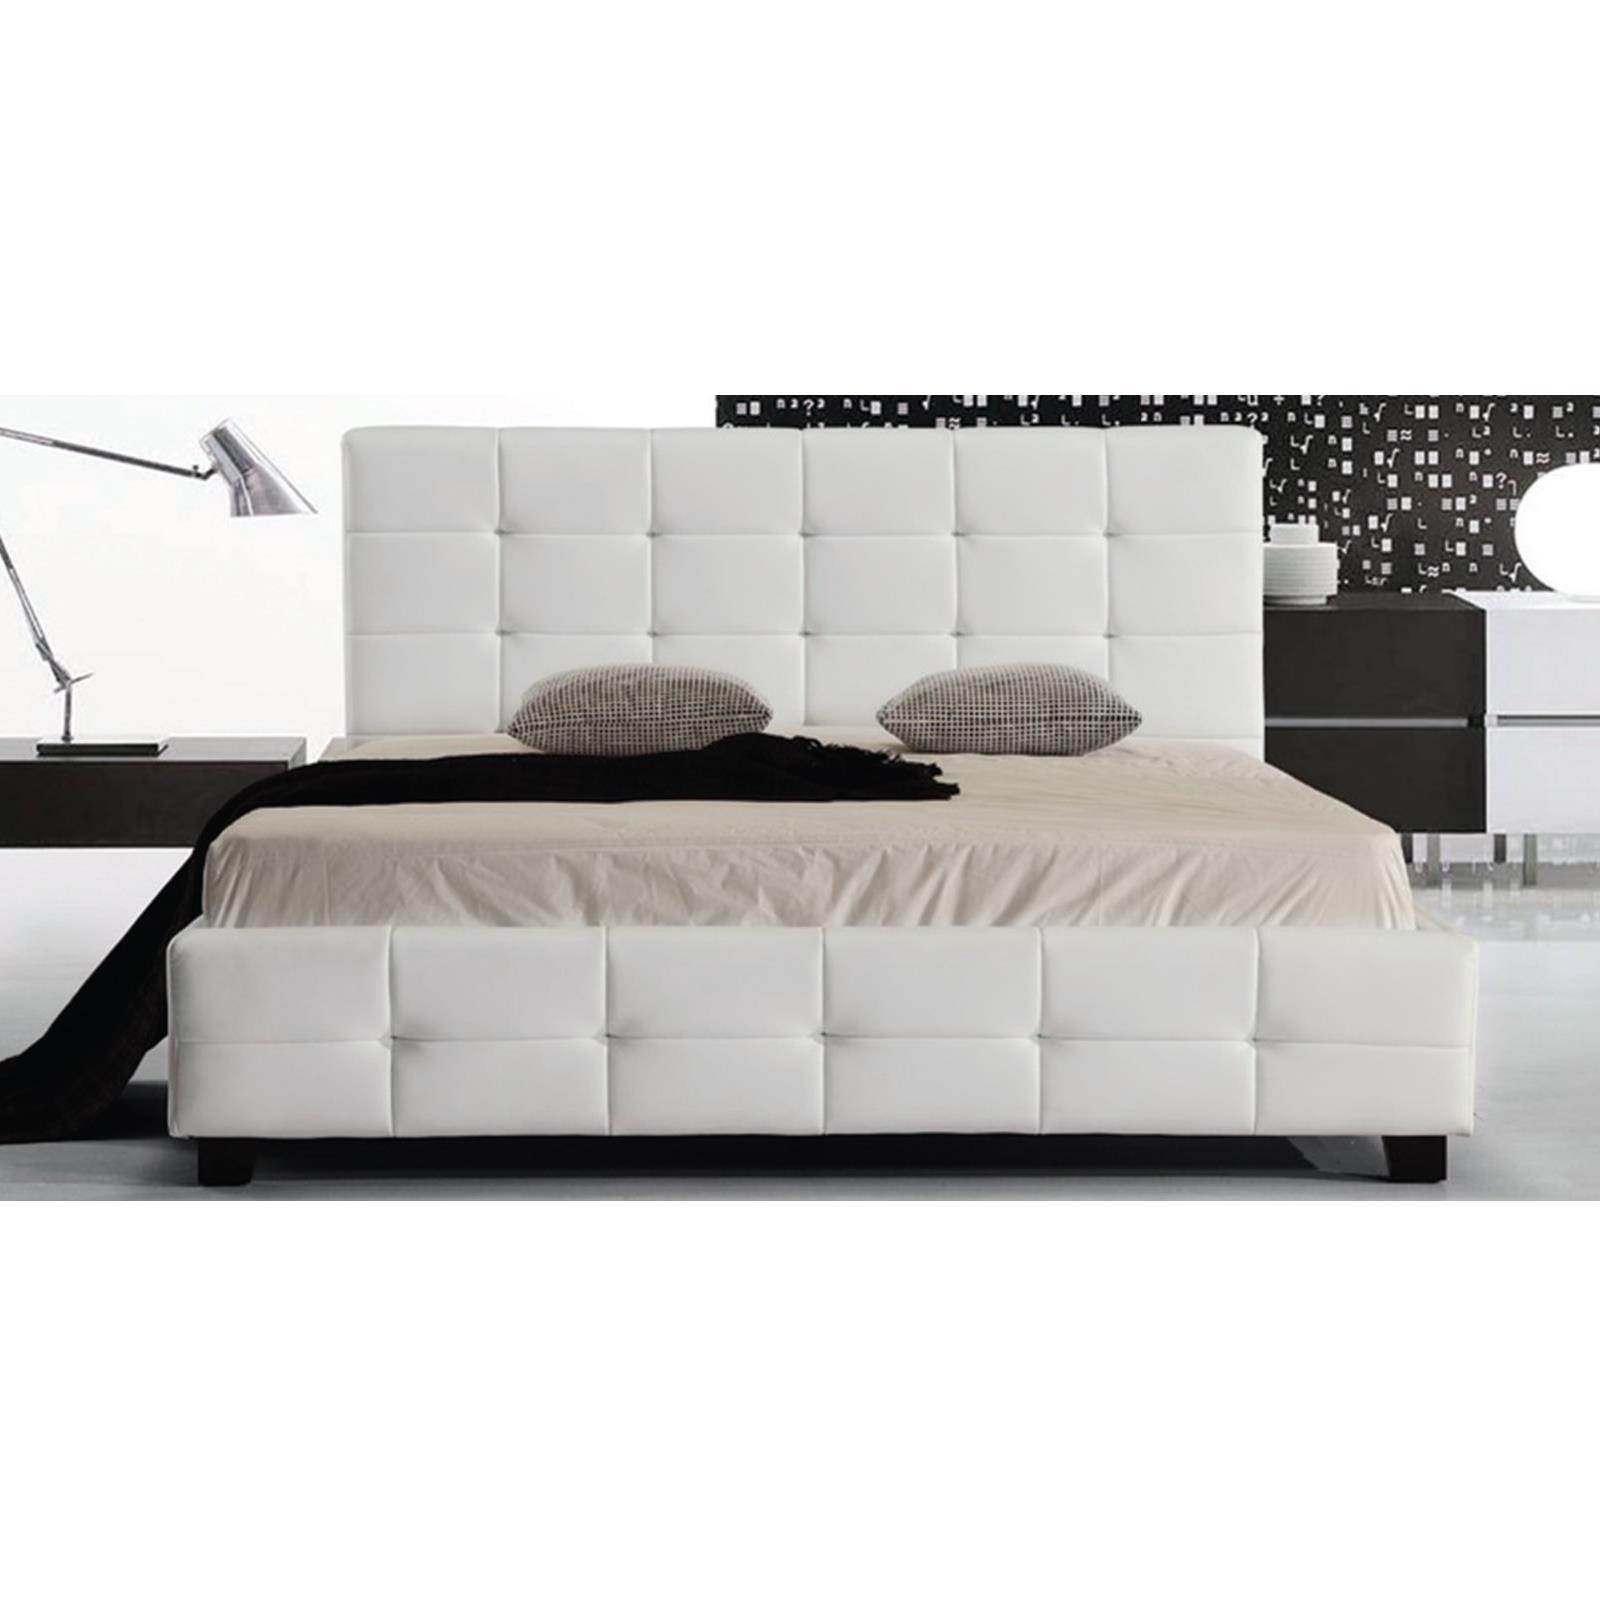 FIDEL κρεβάτι διπλό Pu άσπρο Υ107x215x168εκ. (Στρώμα 160x200εκ.)